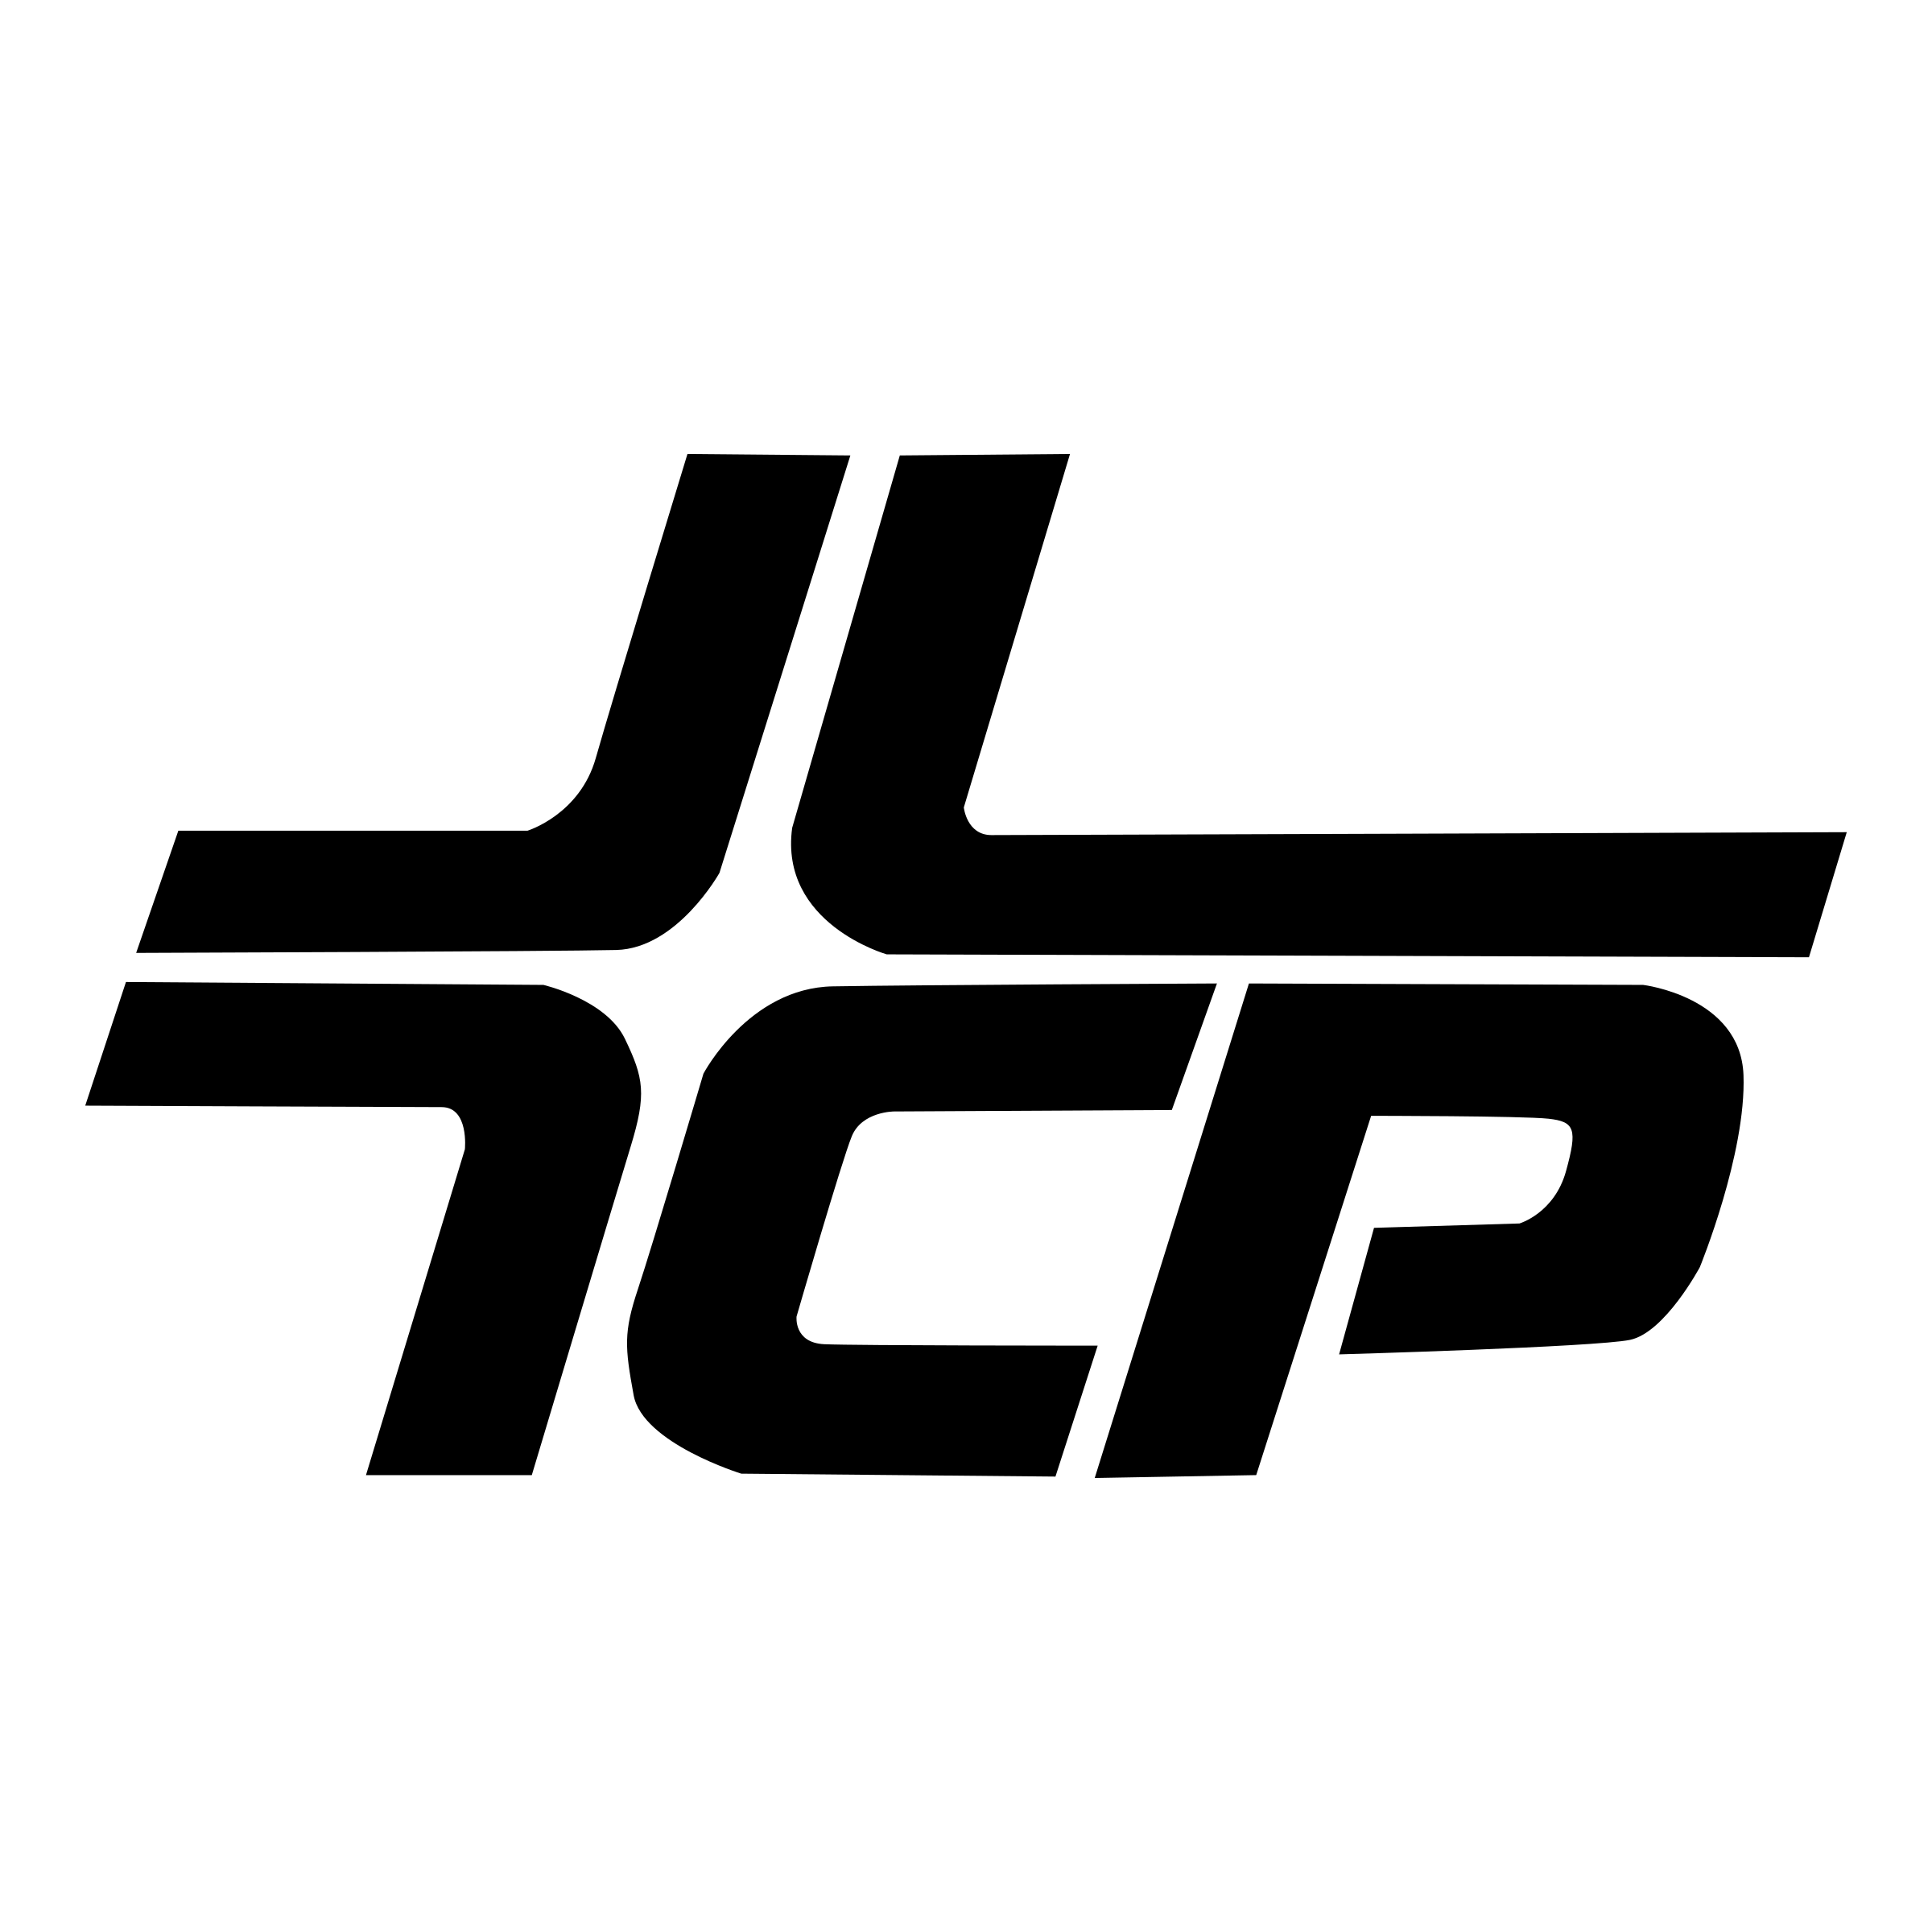 CP Logo PNG Transparent & SVG Vector.